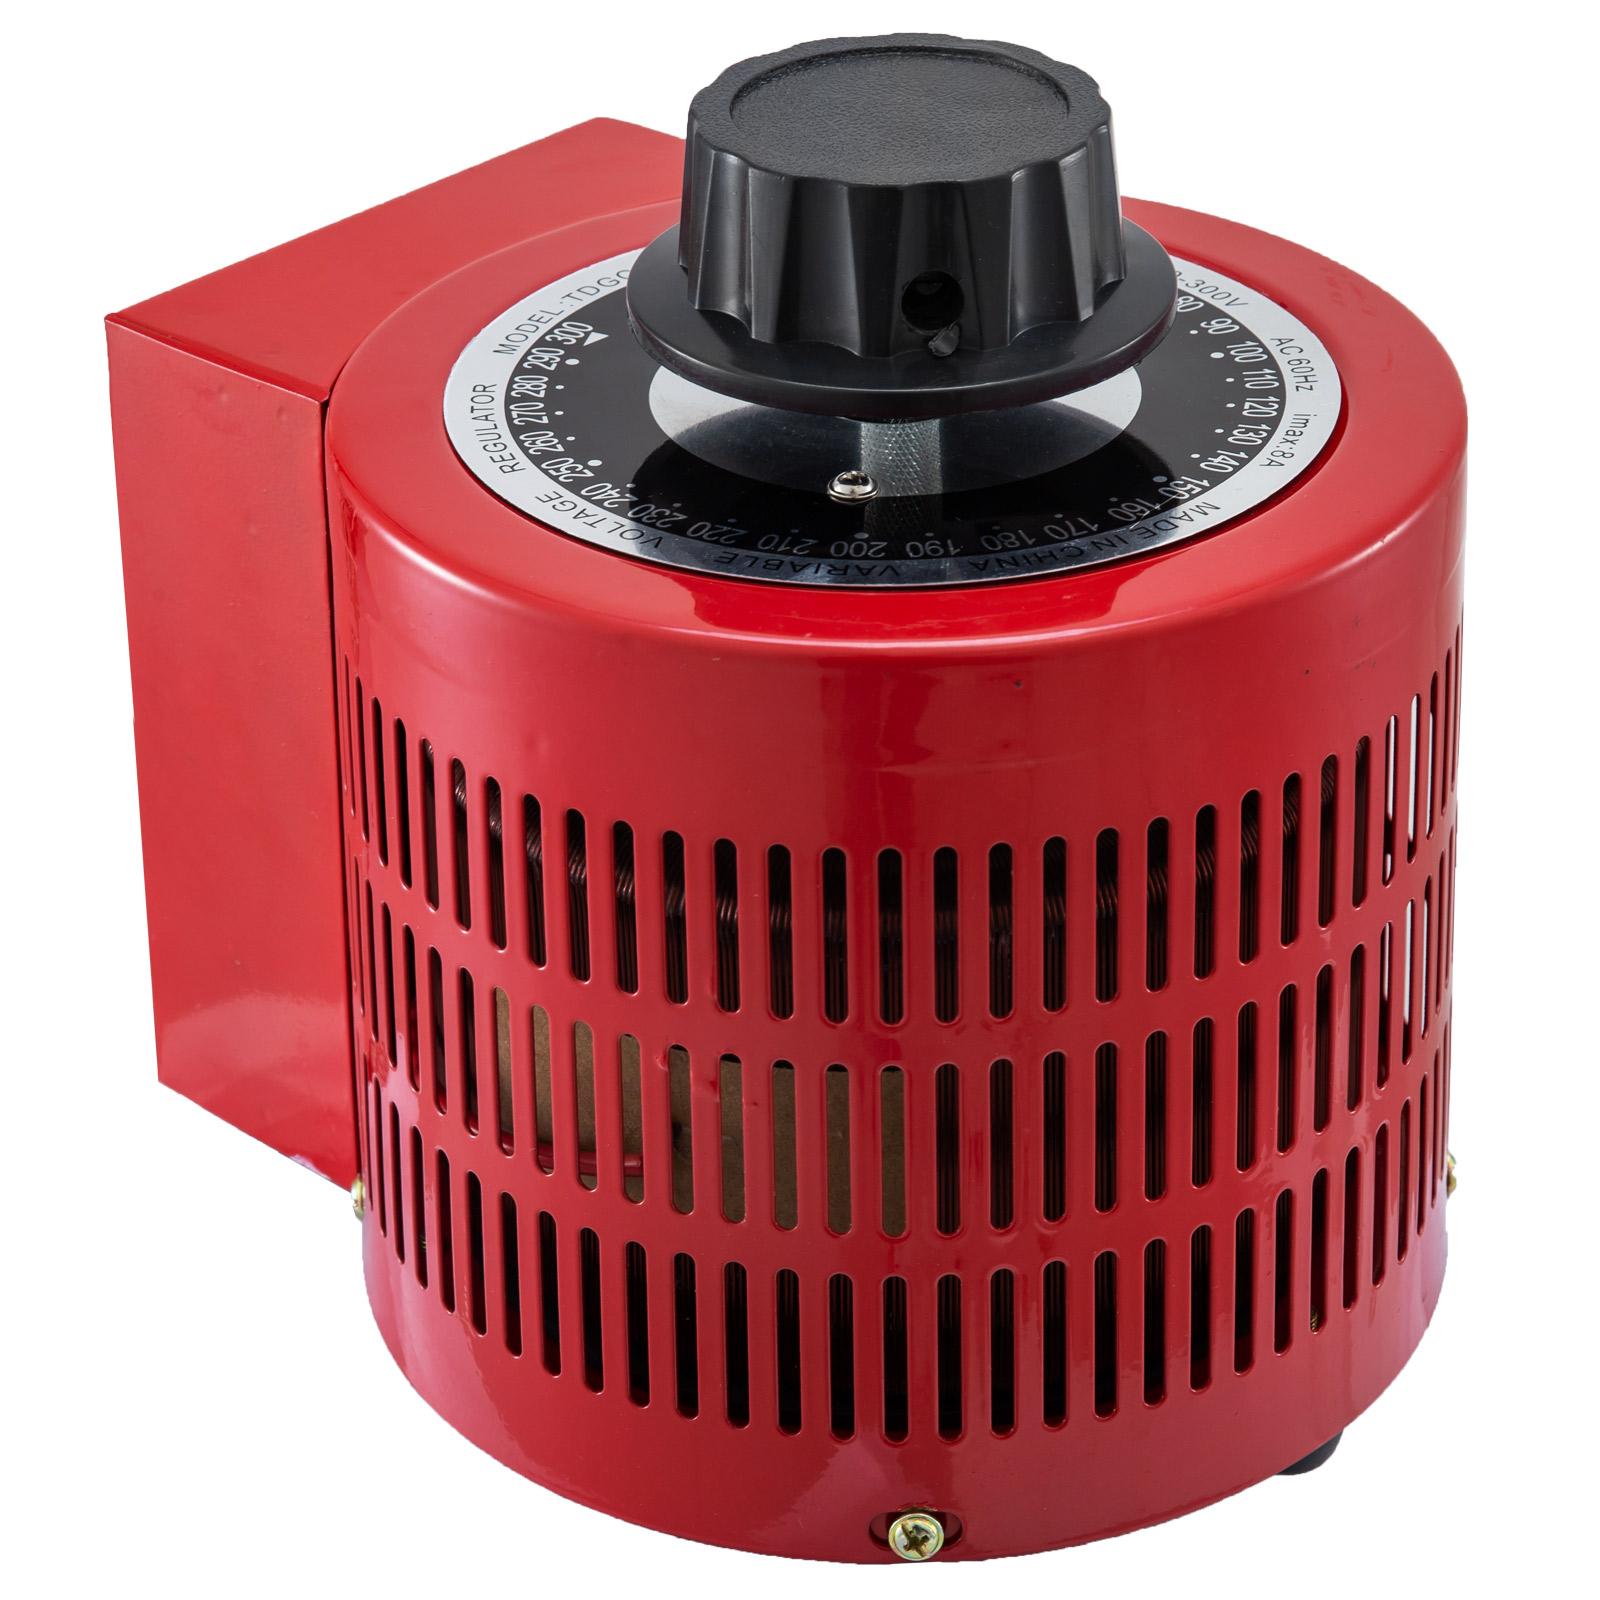 Auto-Variac-Variable-Transformer-0-5-1-2-3KVA-Regulator-pure-copper-coil-220V thumbnail 58